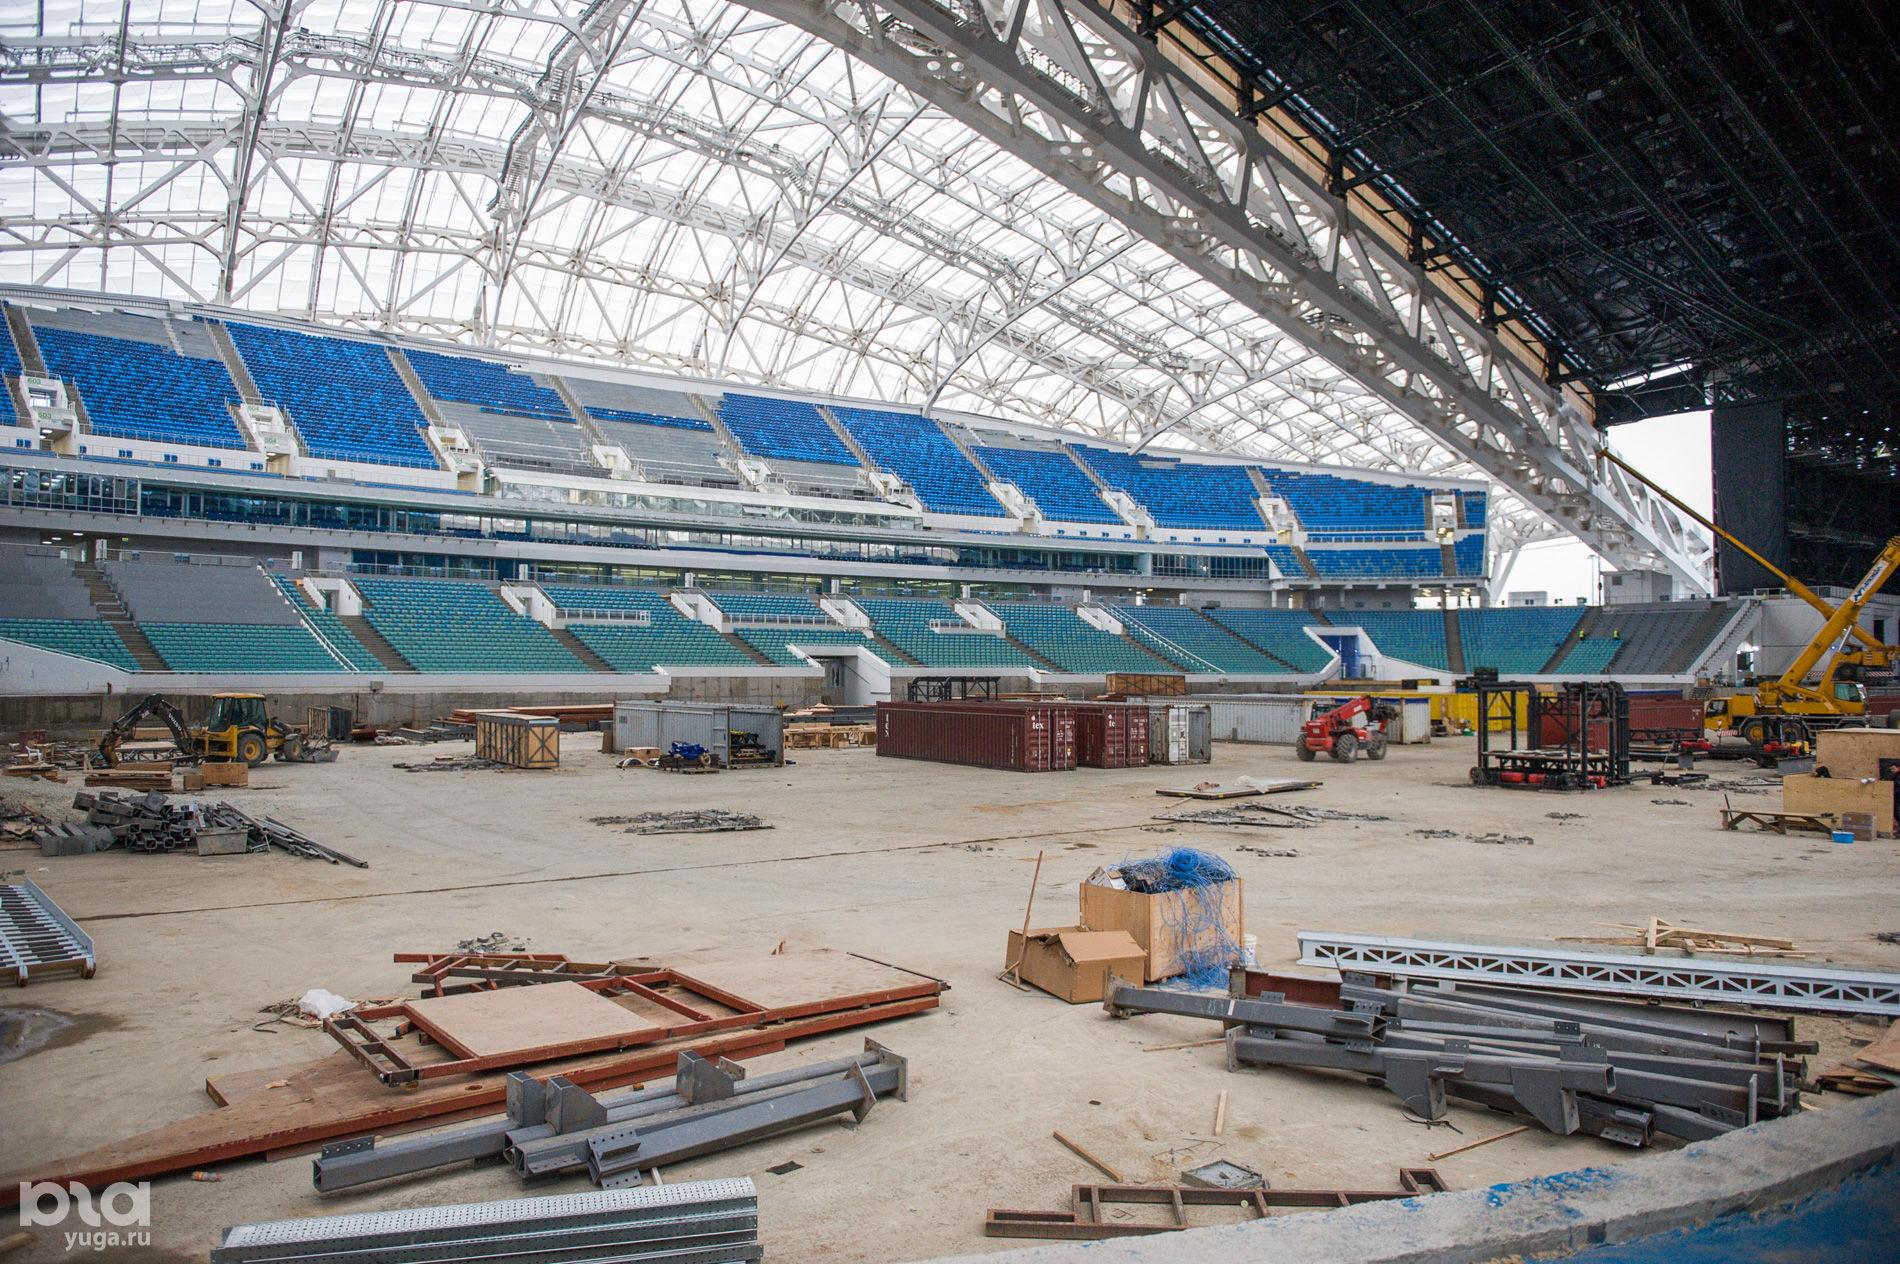 Комиссия ФИФА посетила стадион «Фишт» в Сочи  ©Фото Нины Зотиной, Юга.ру